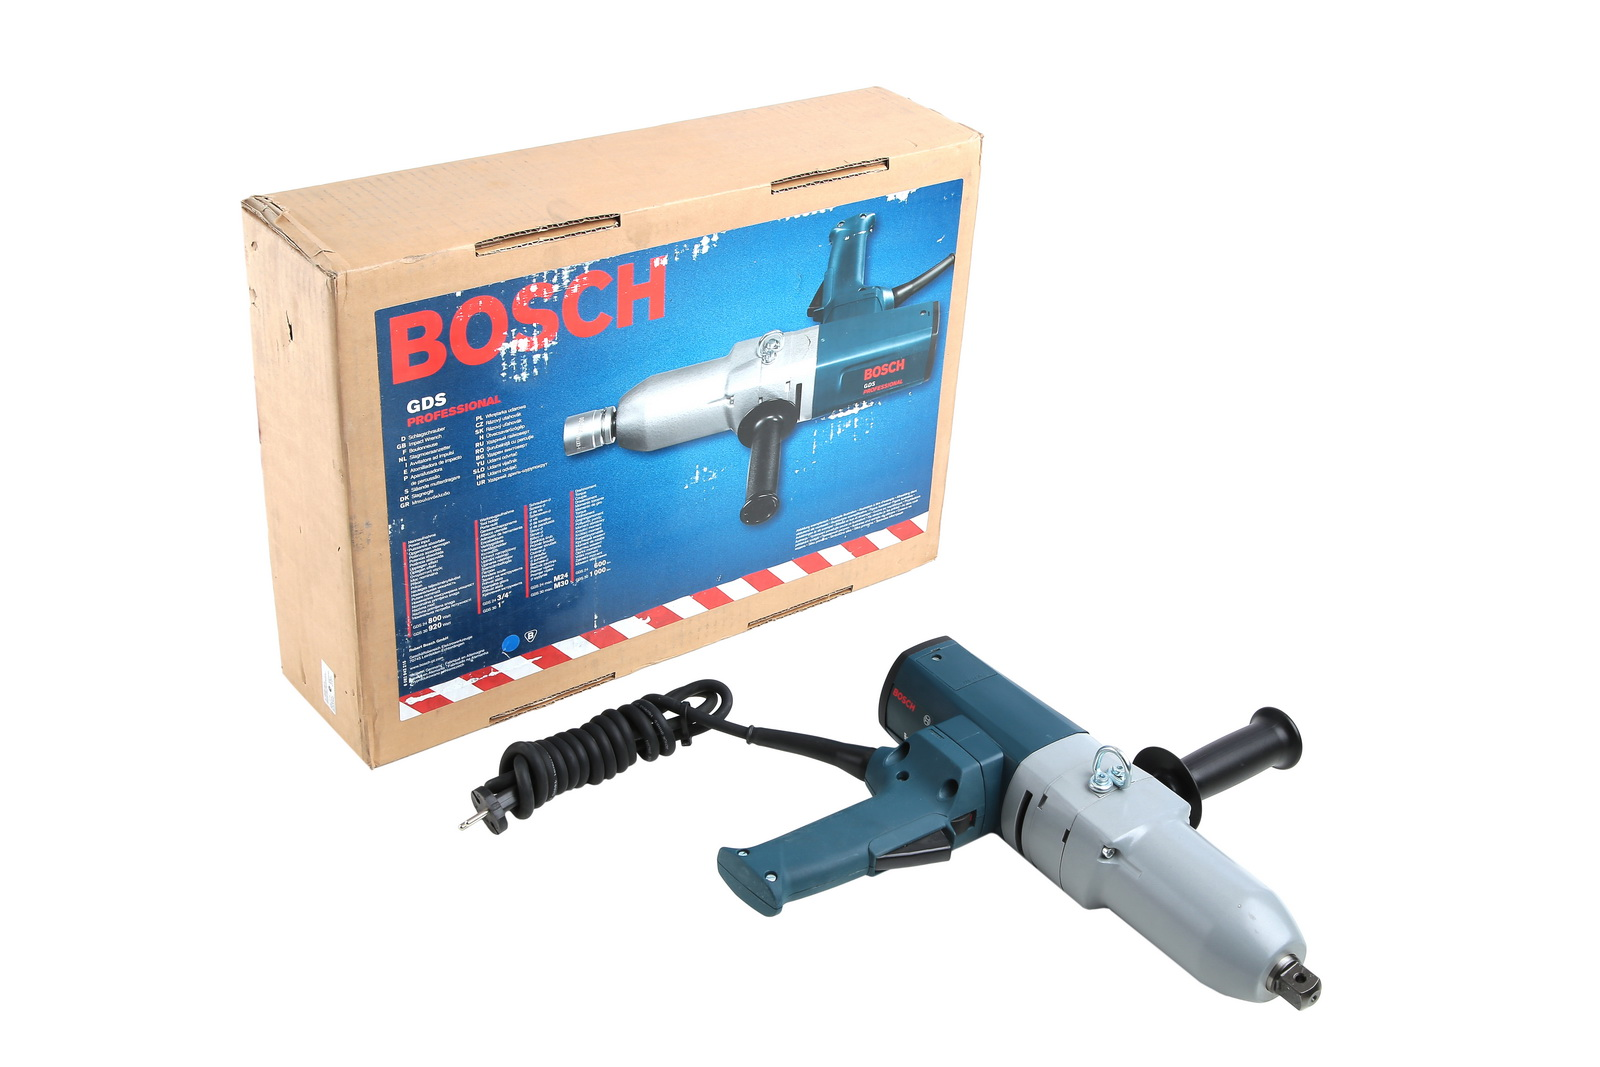 Гайковерт ударный Bosch Gds 24 (0.601.434.108)